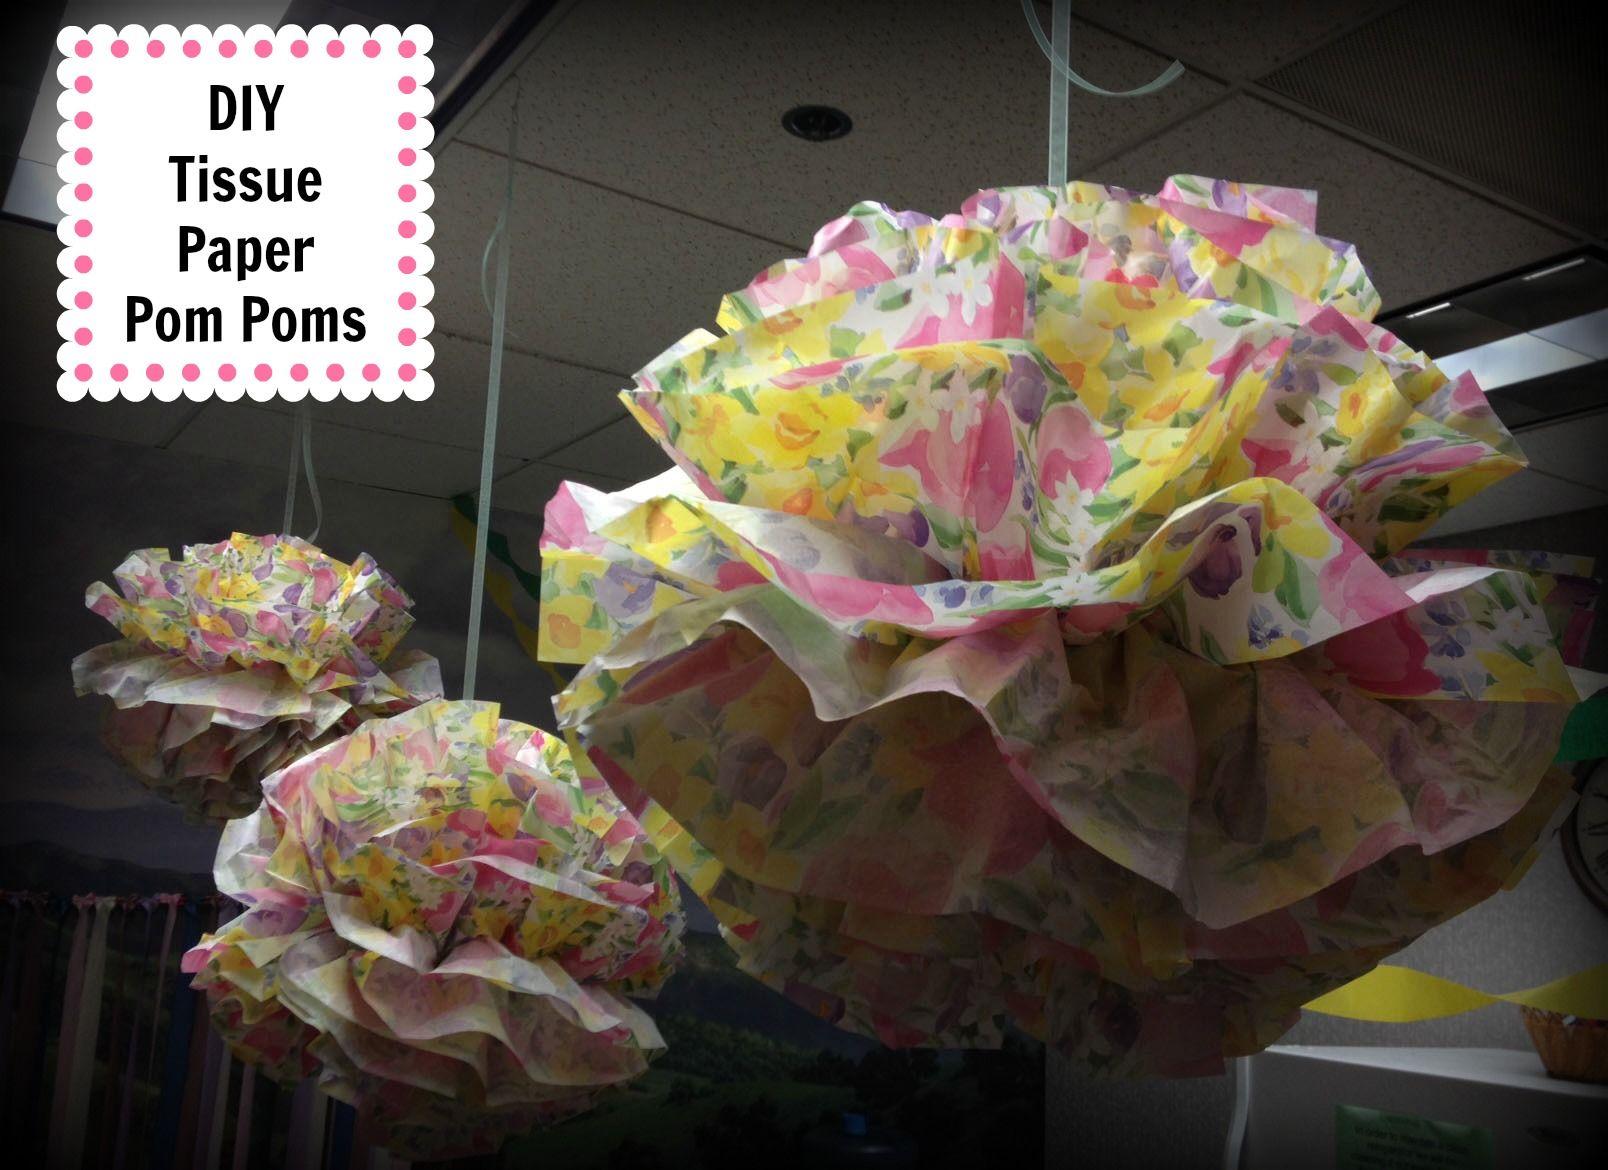 Hanging Pom Pom Decorations Diy Tissue Paper Pom Poms Diy Party Planning Pinterest